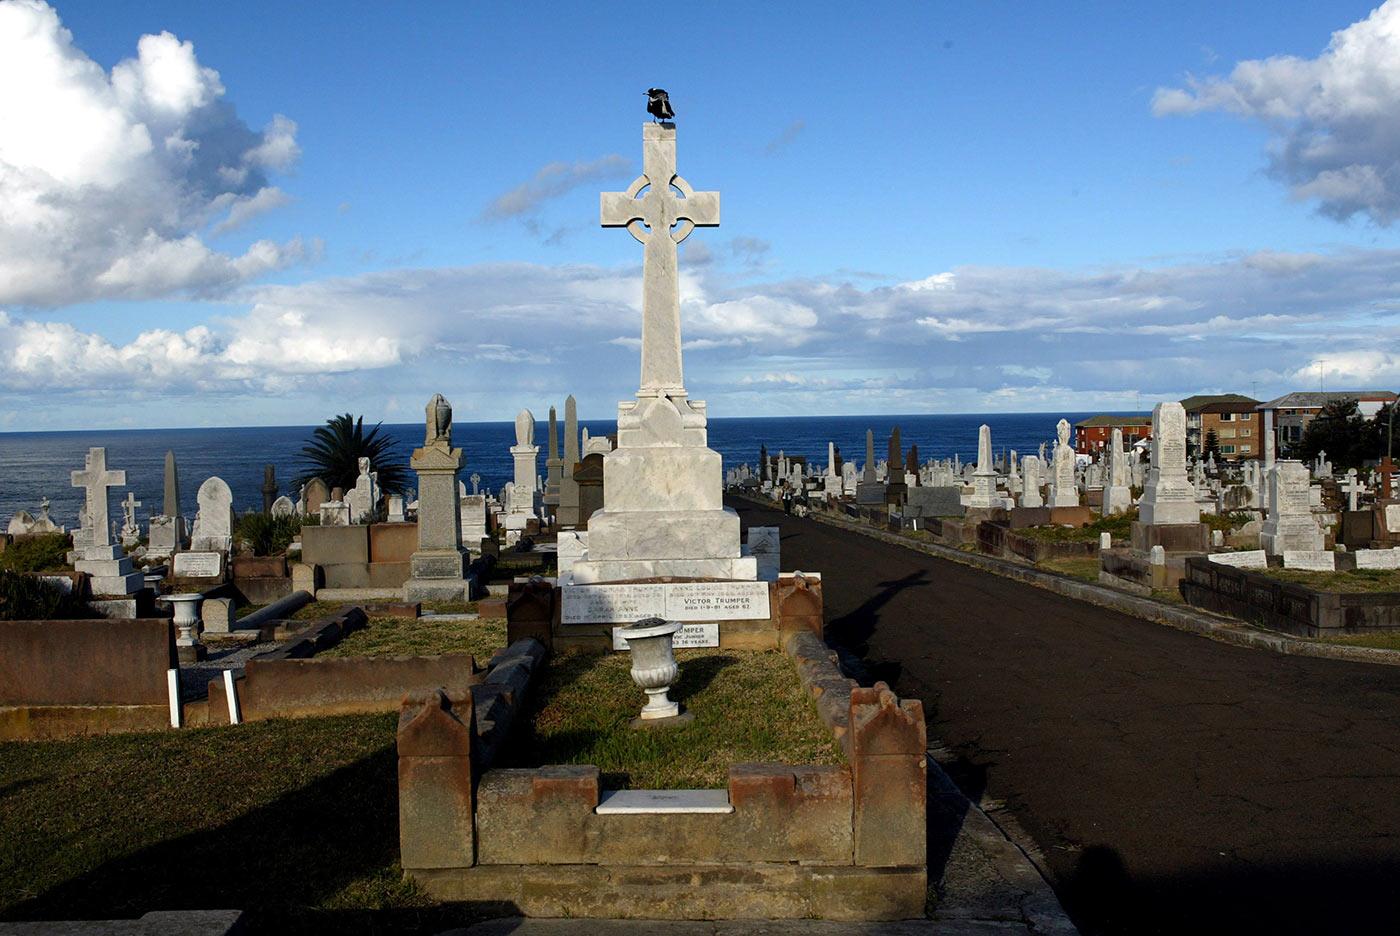 Trumper's grave in Waverley Cemetery, Sydney